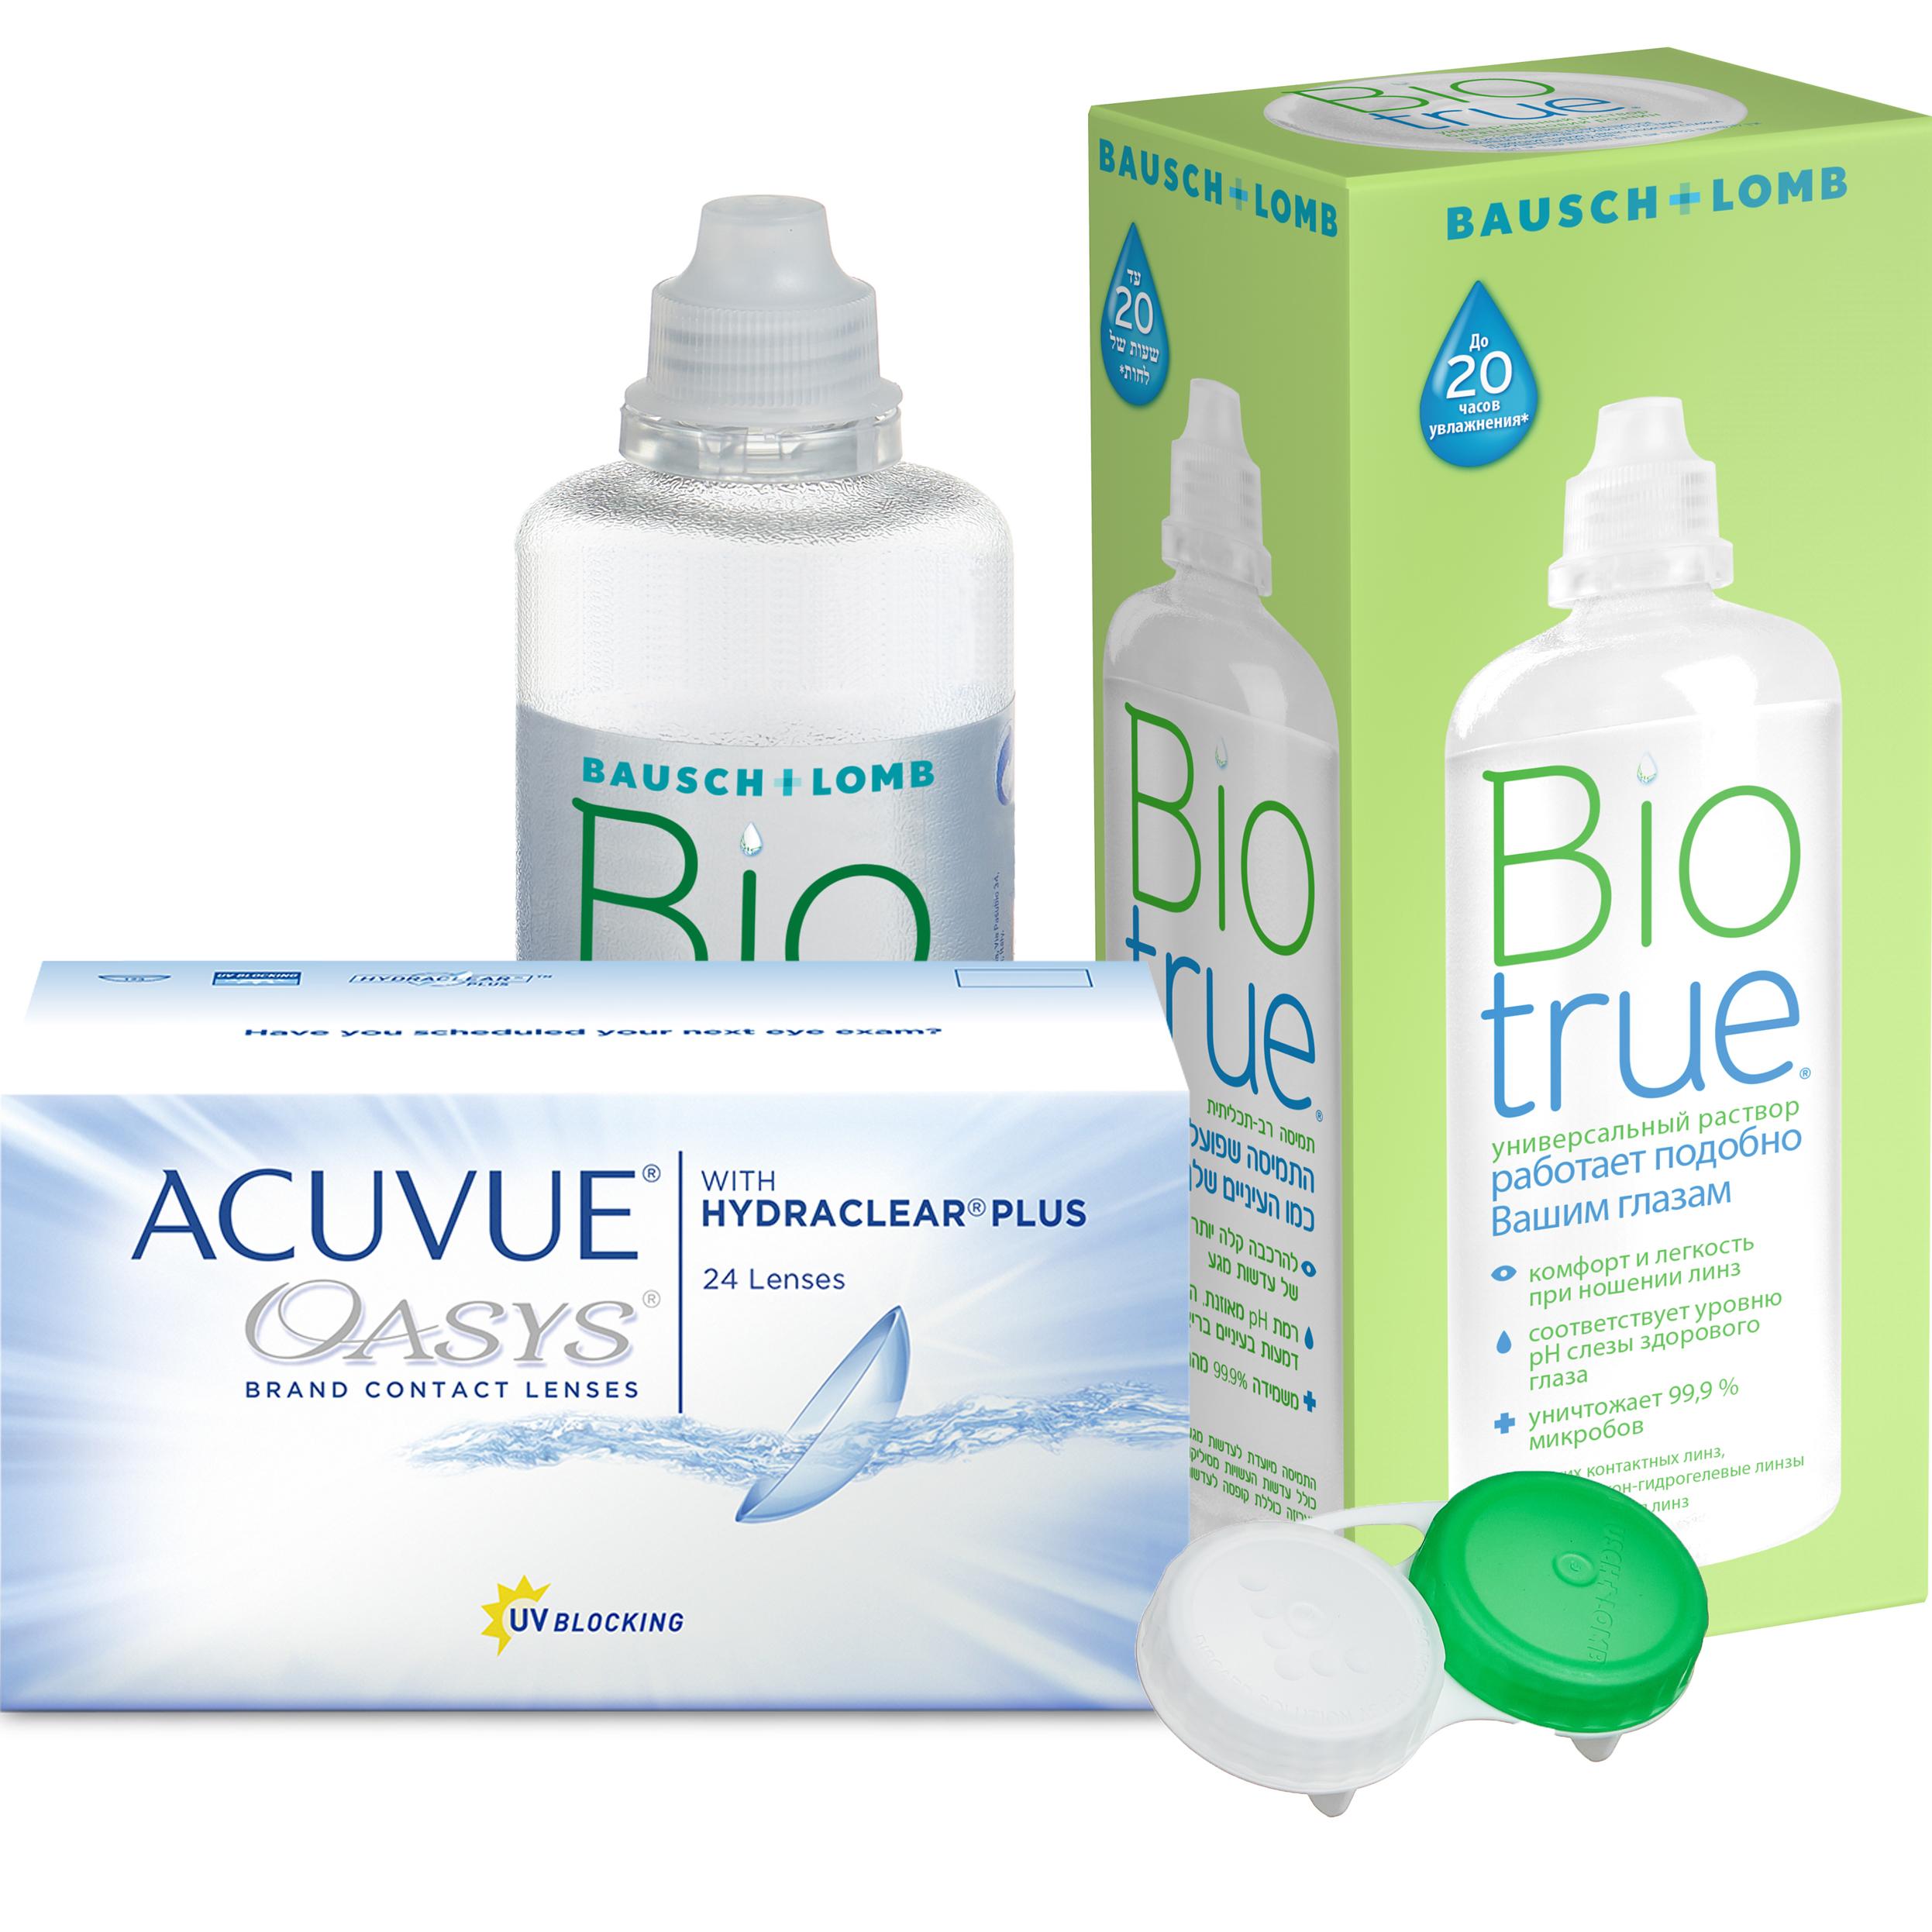 Купить Oasys with Hydraclear Plus 24 линзы + Biotrue, Контактные линзы Acuvue Oasys with Hydraclear Plus 24 линзы R 8.4 -1, 25 + Biotrue 300 мл